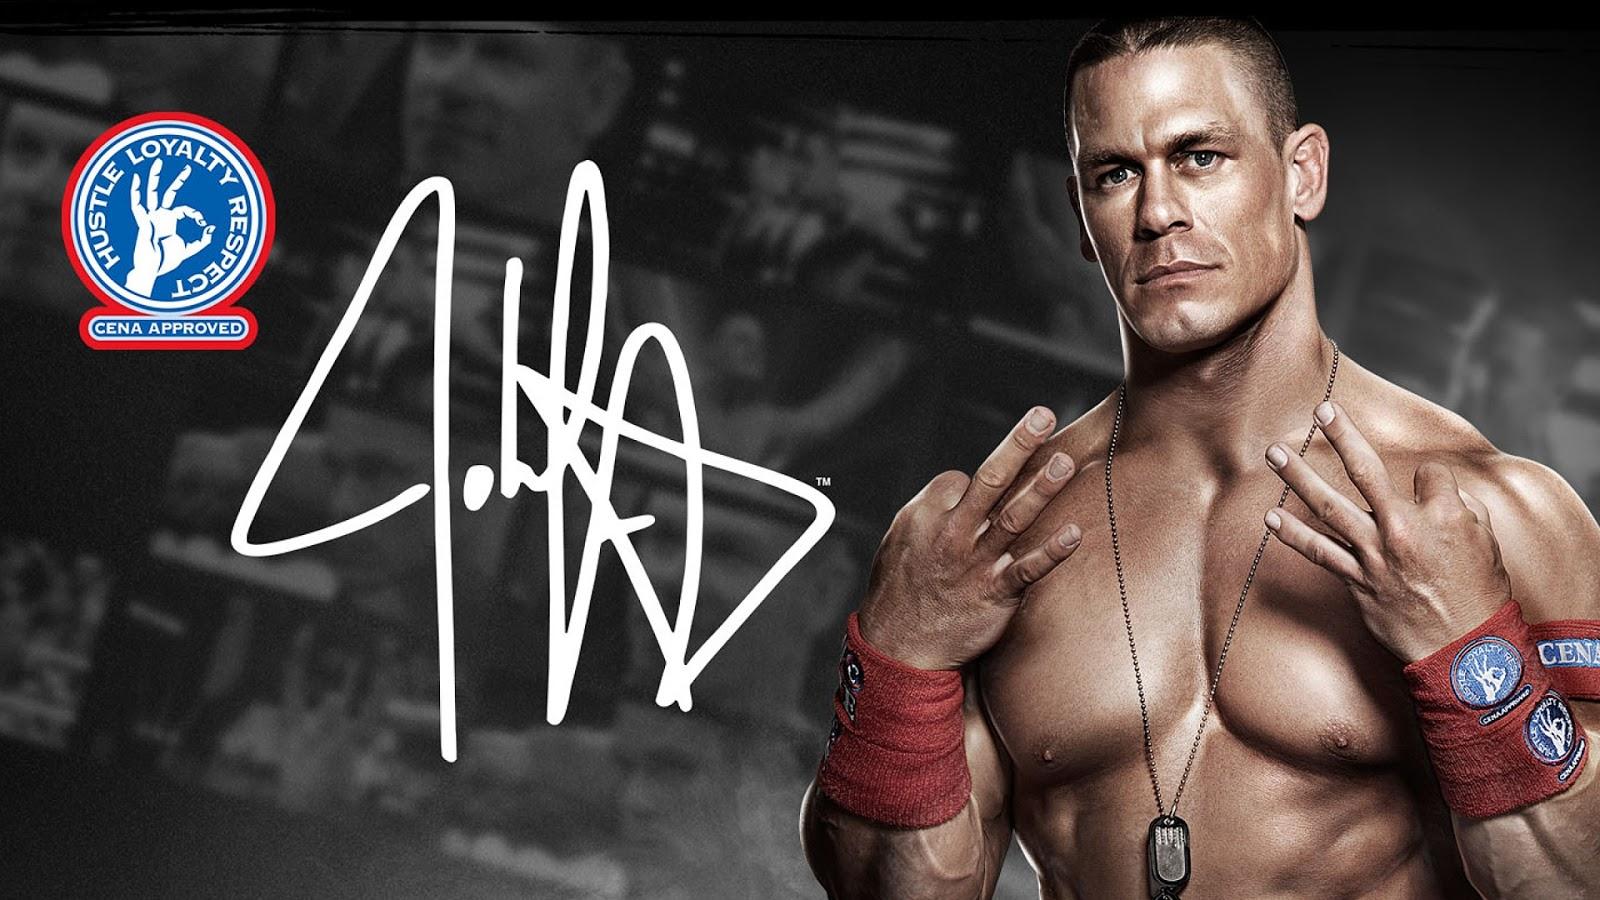 Photo X Life: John Cena Champion Wallpapers